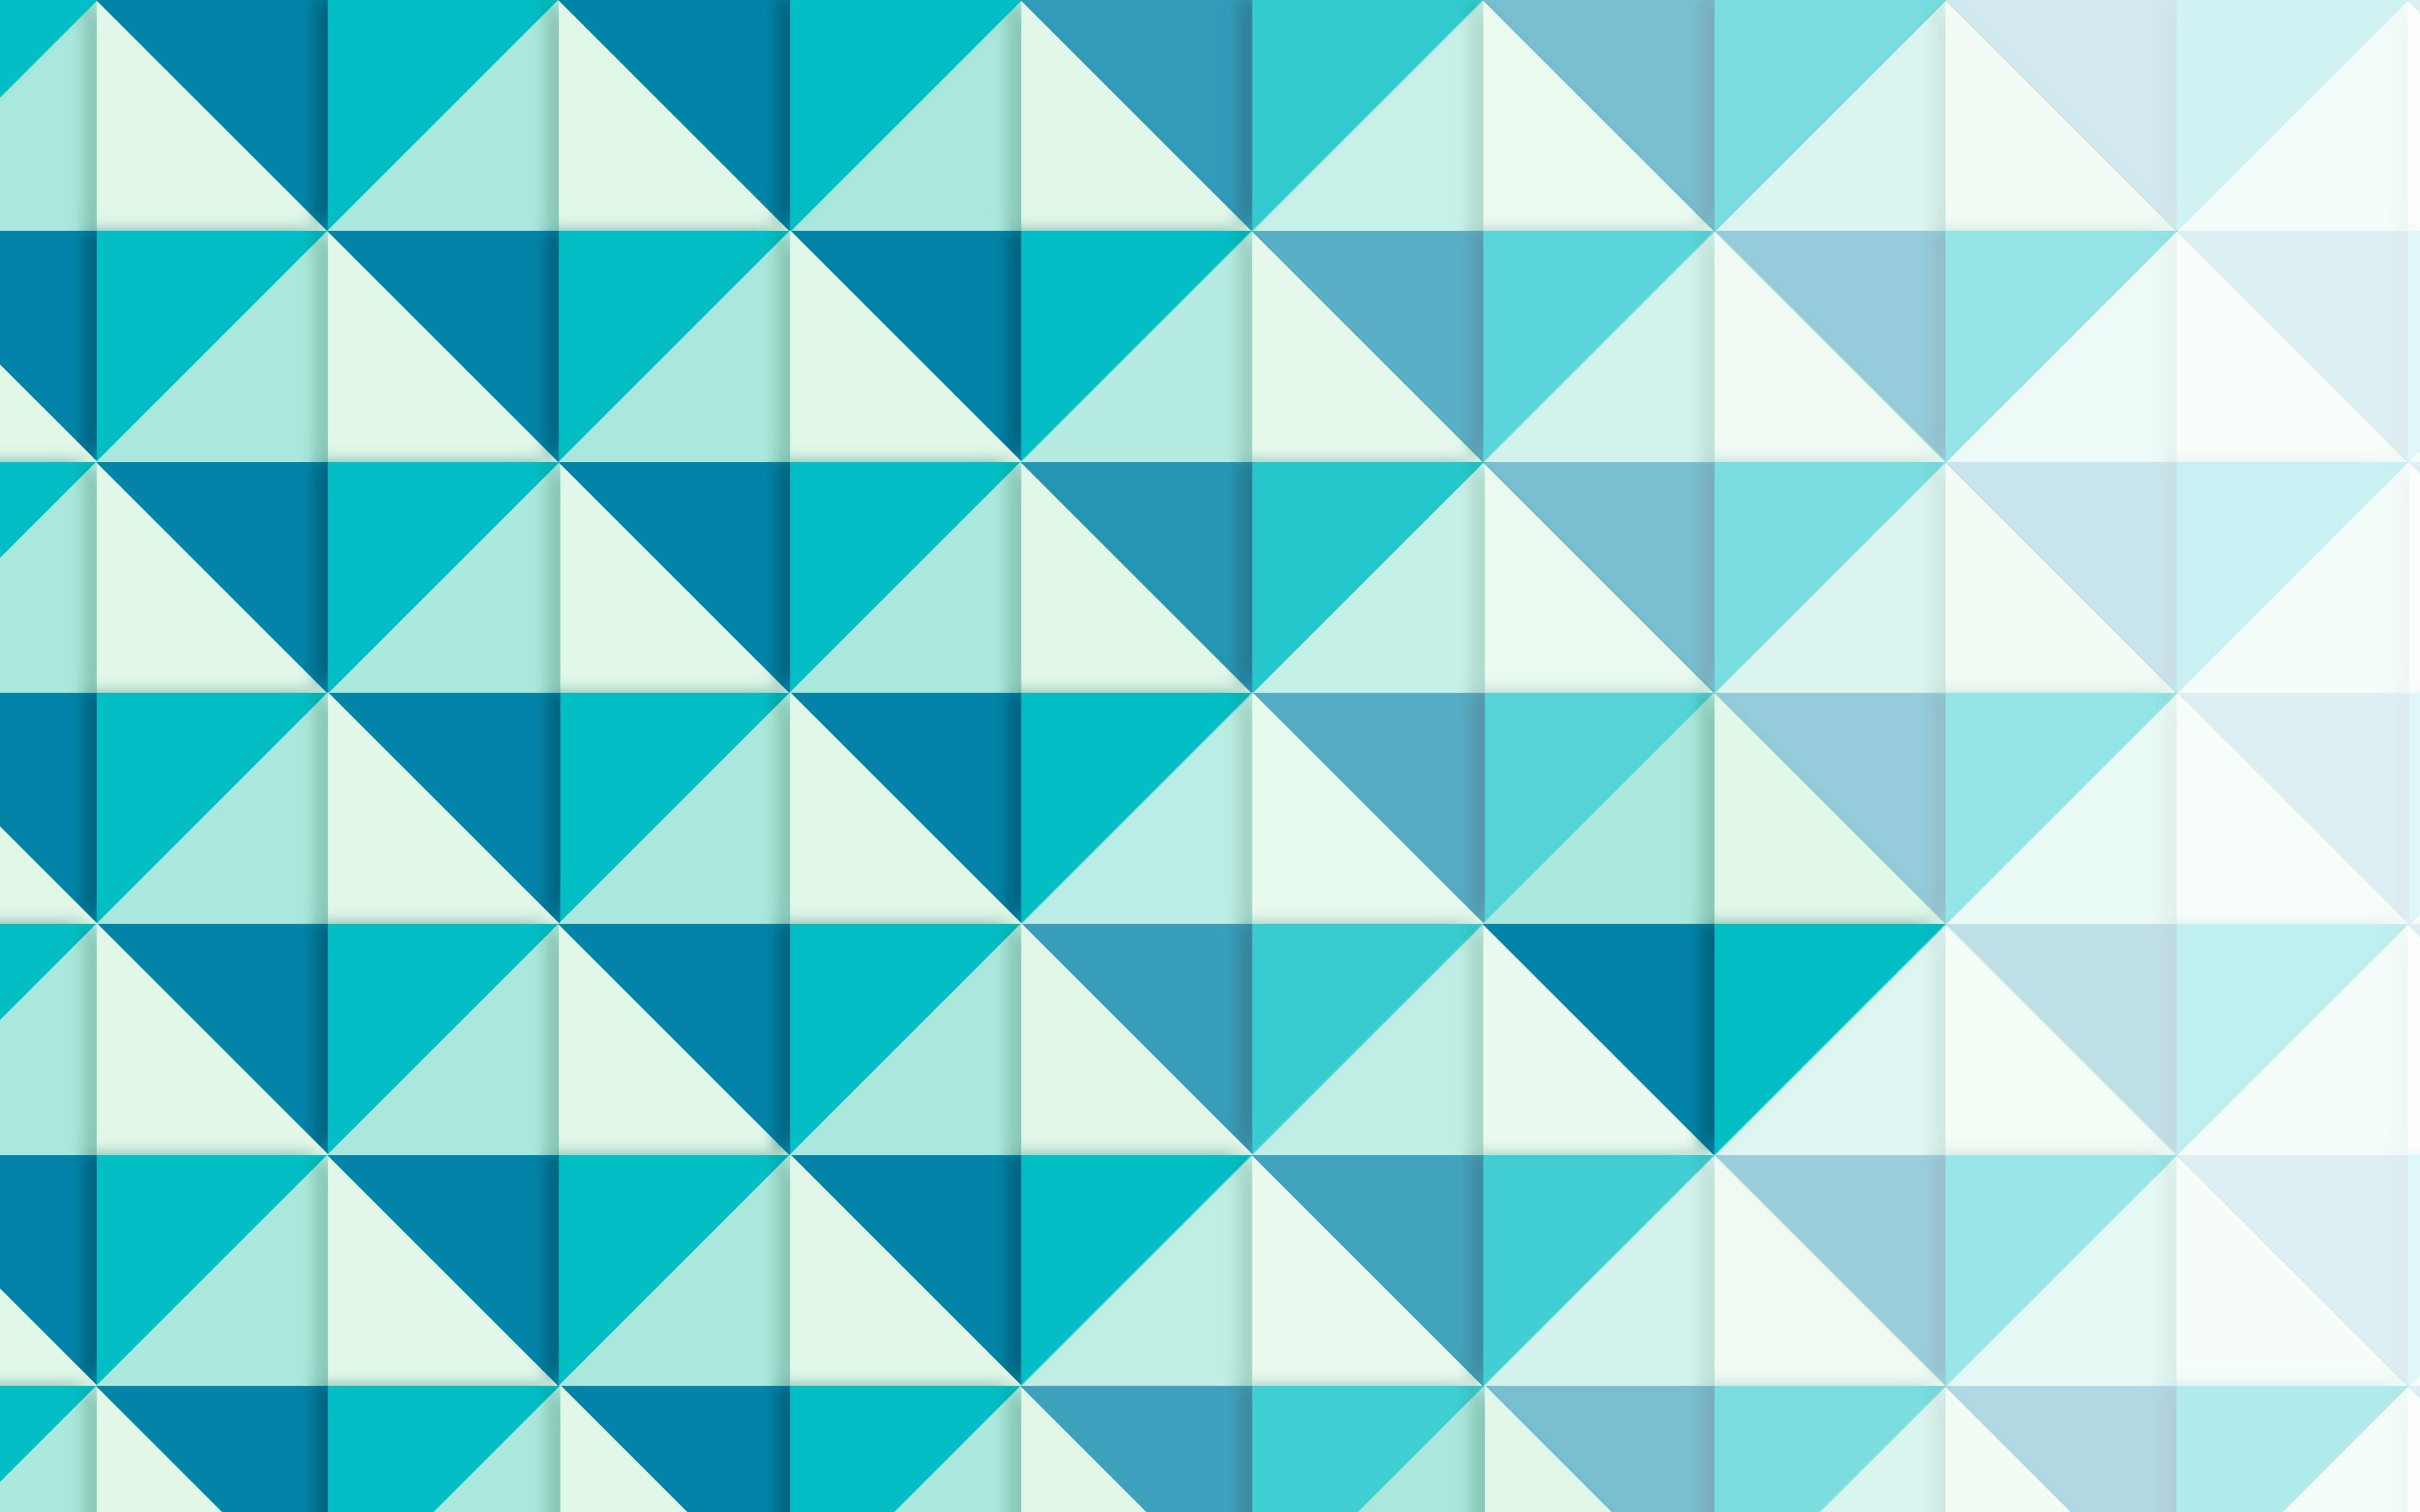 background-geometric-design-backdrop-texture-h2.jpg